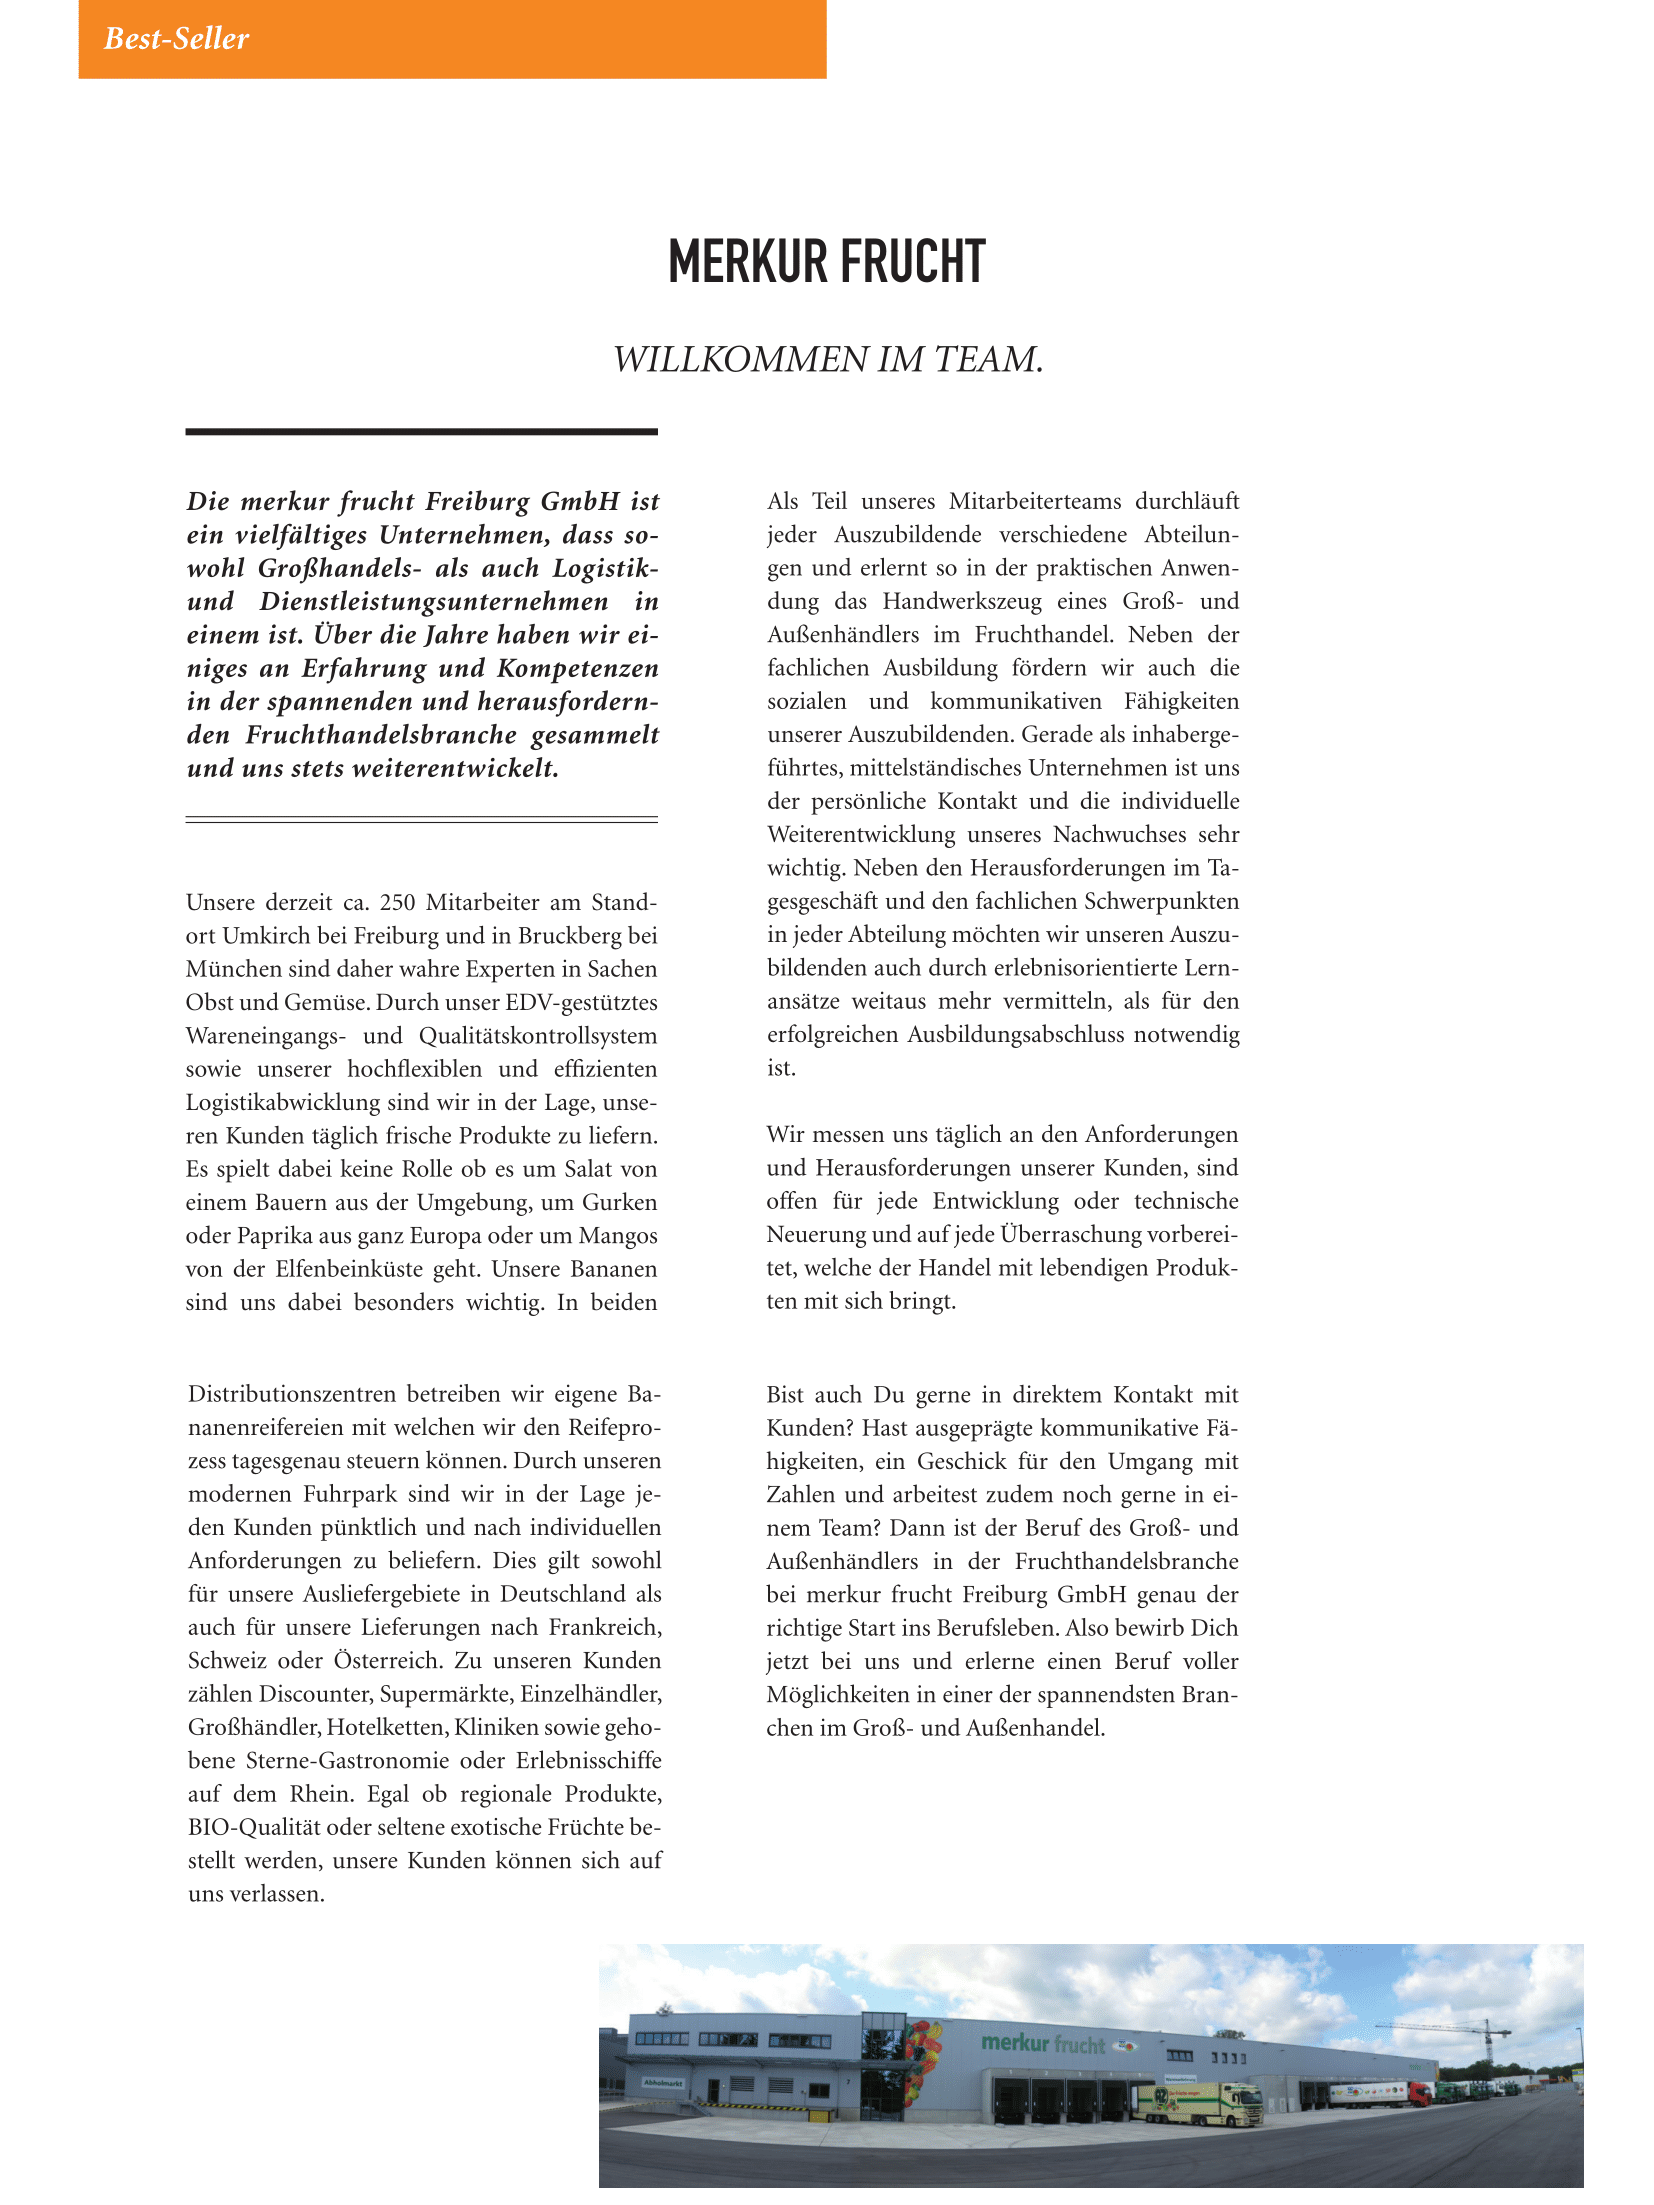 AHB_2016_Korrekturabzug_merkur_frucht_2-1